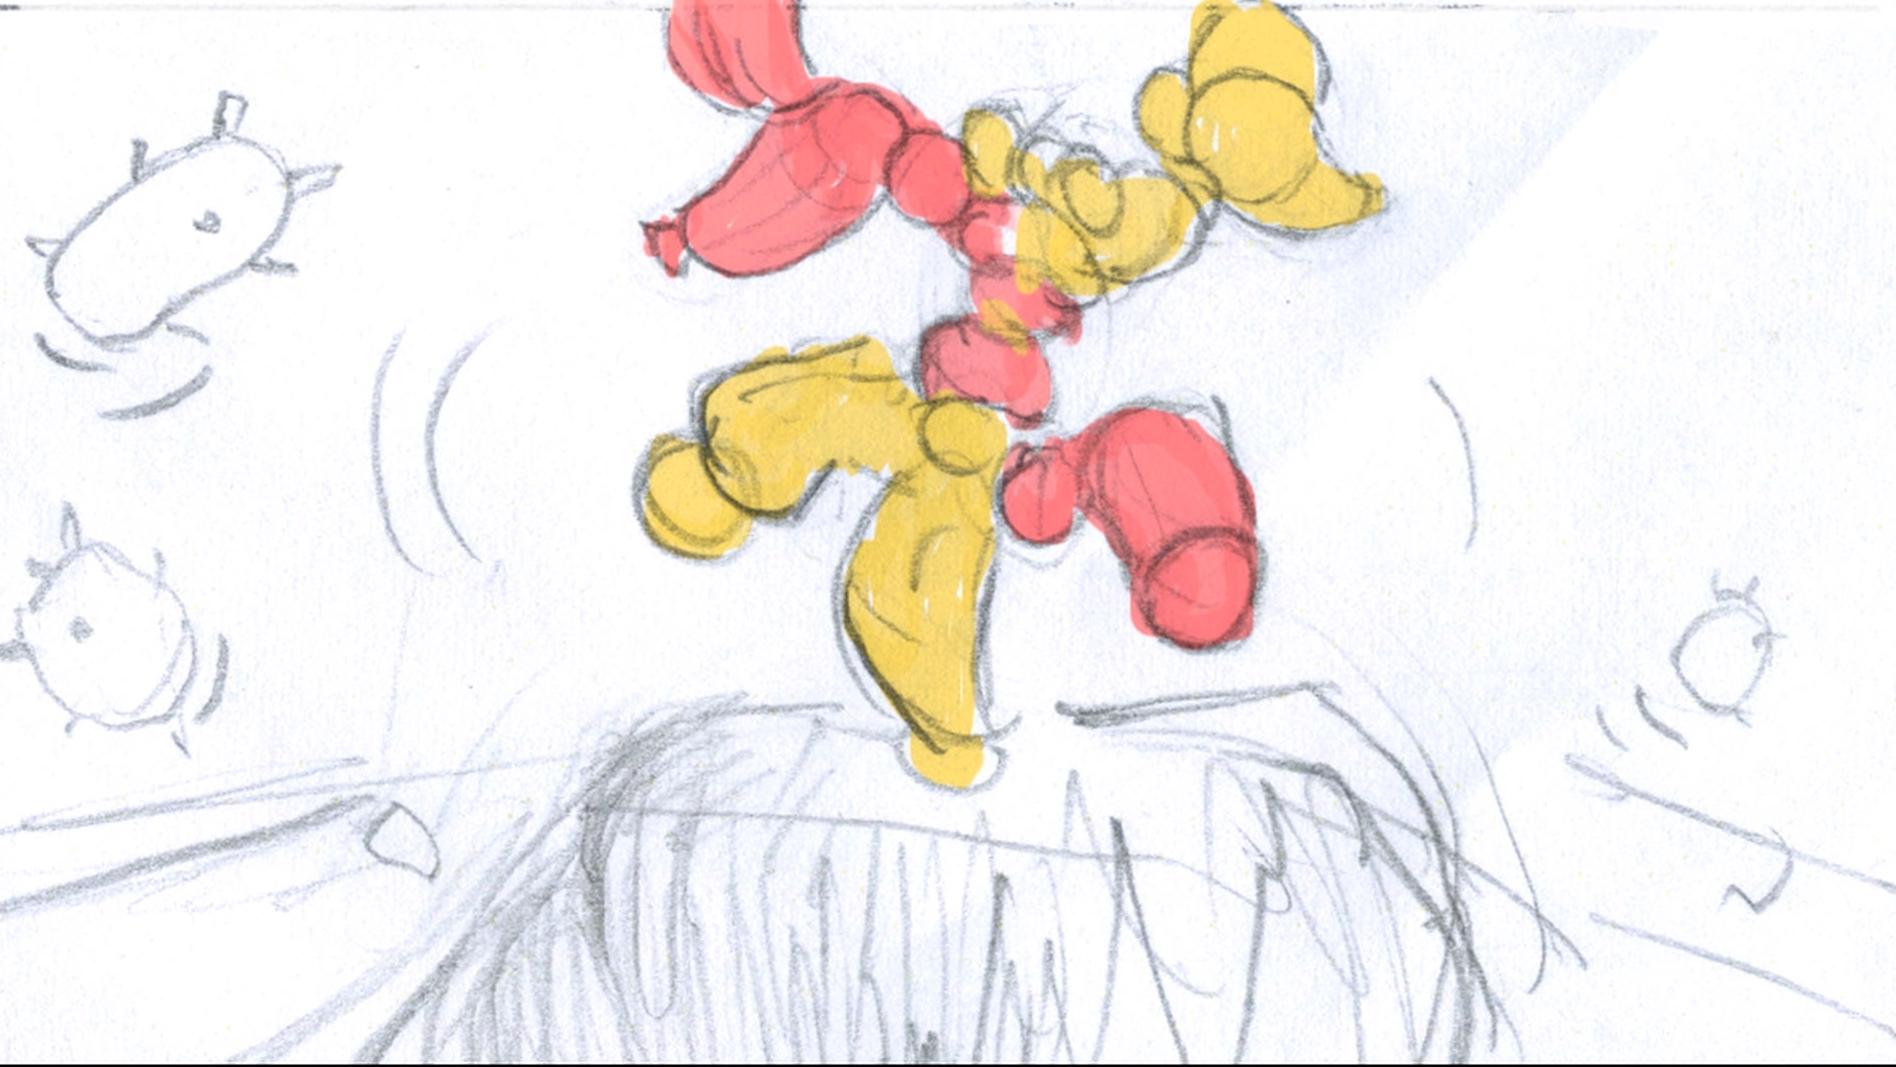 Animatic_10_2_12 (1-01-32-09).jpg